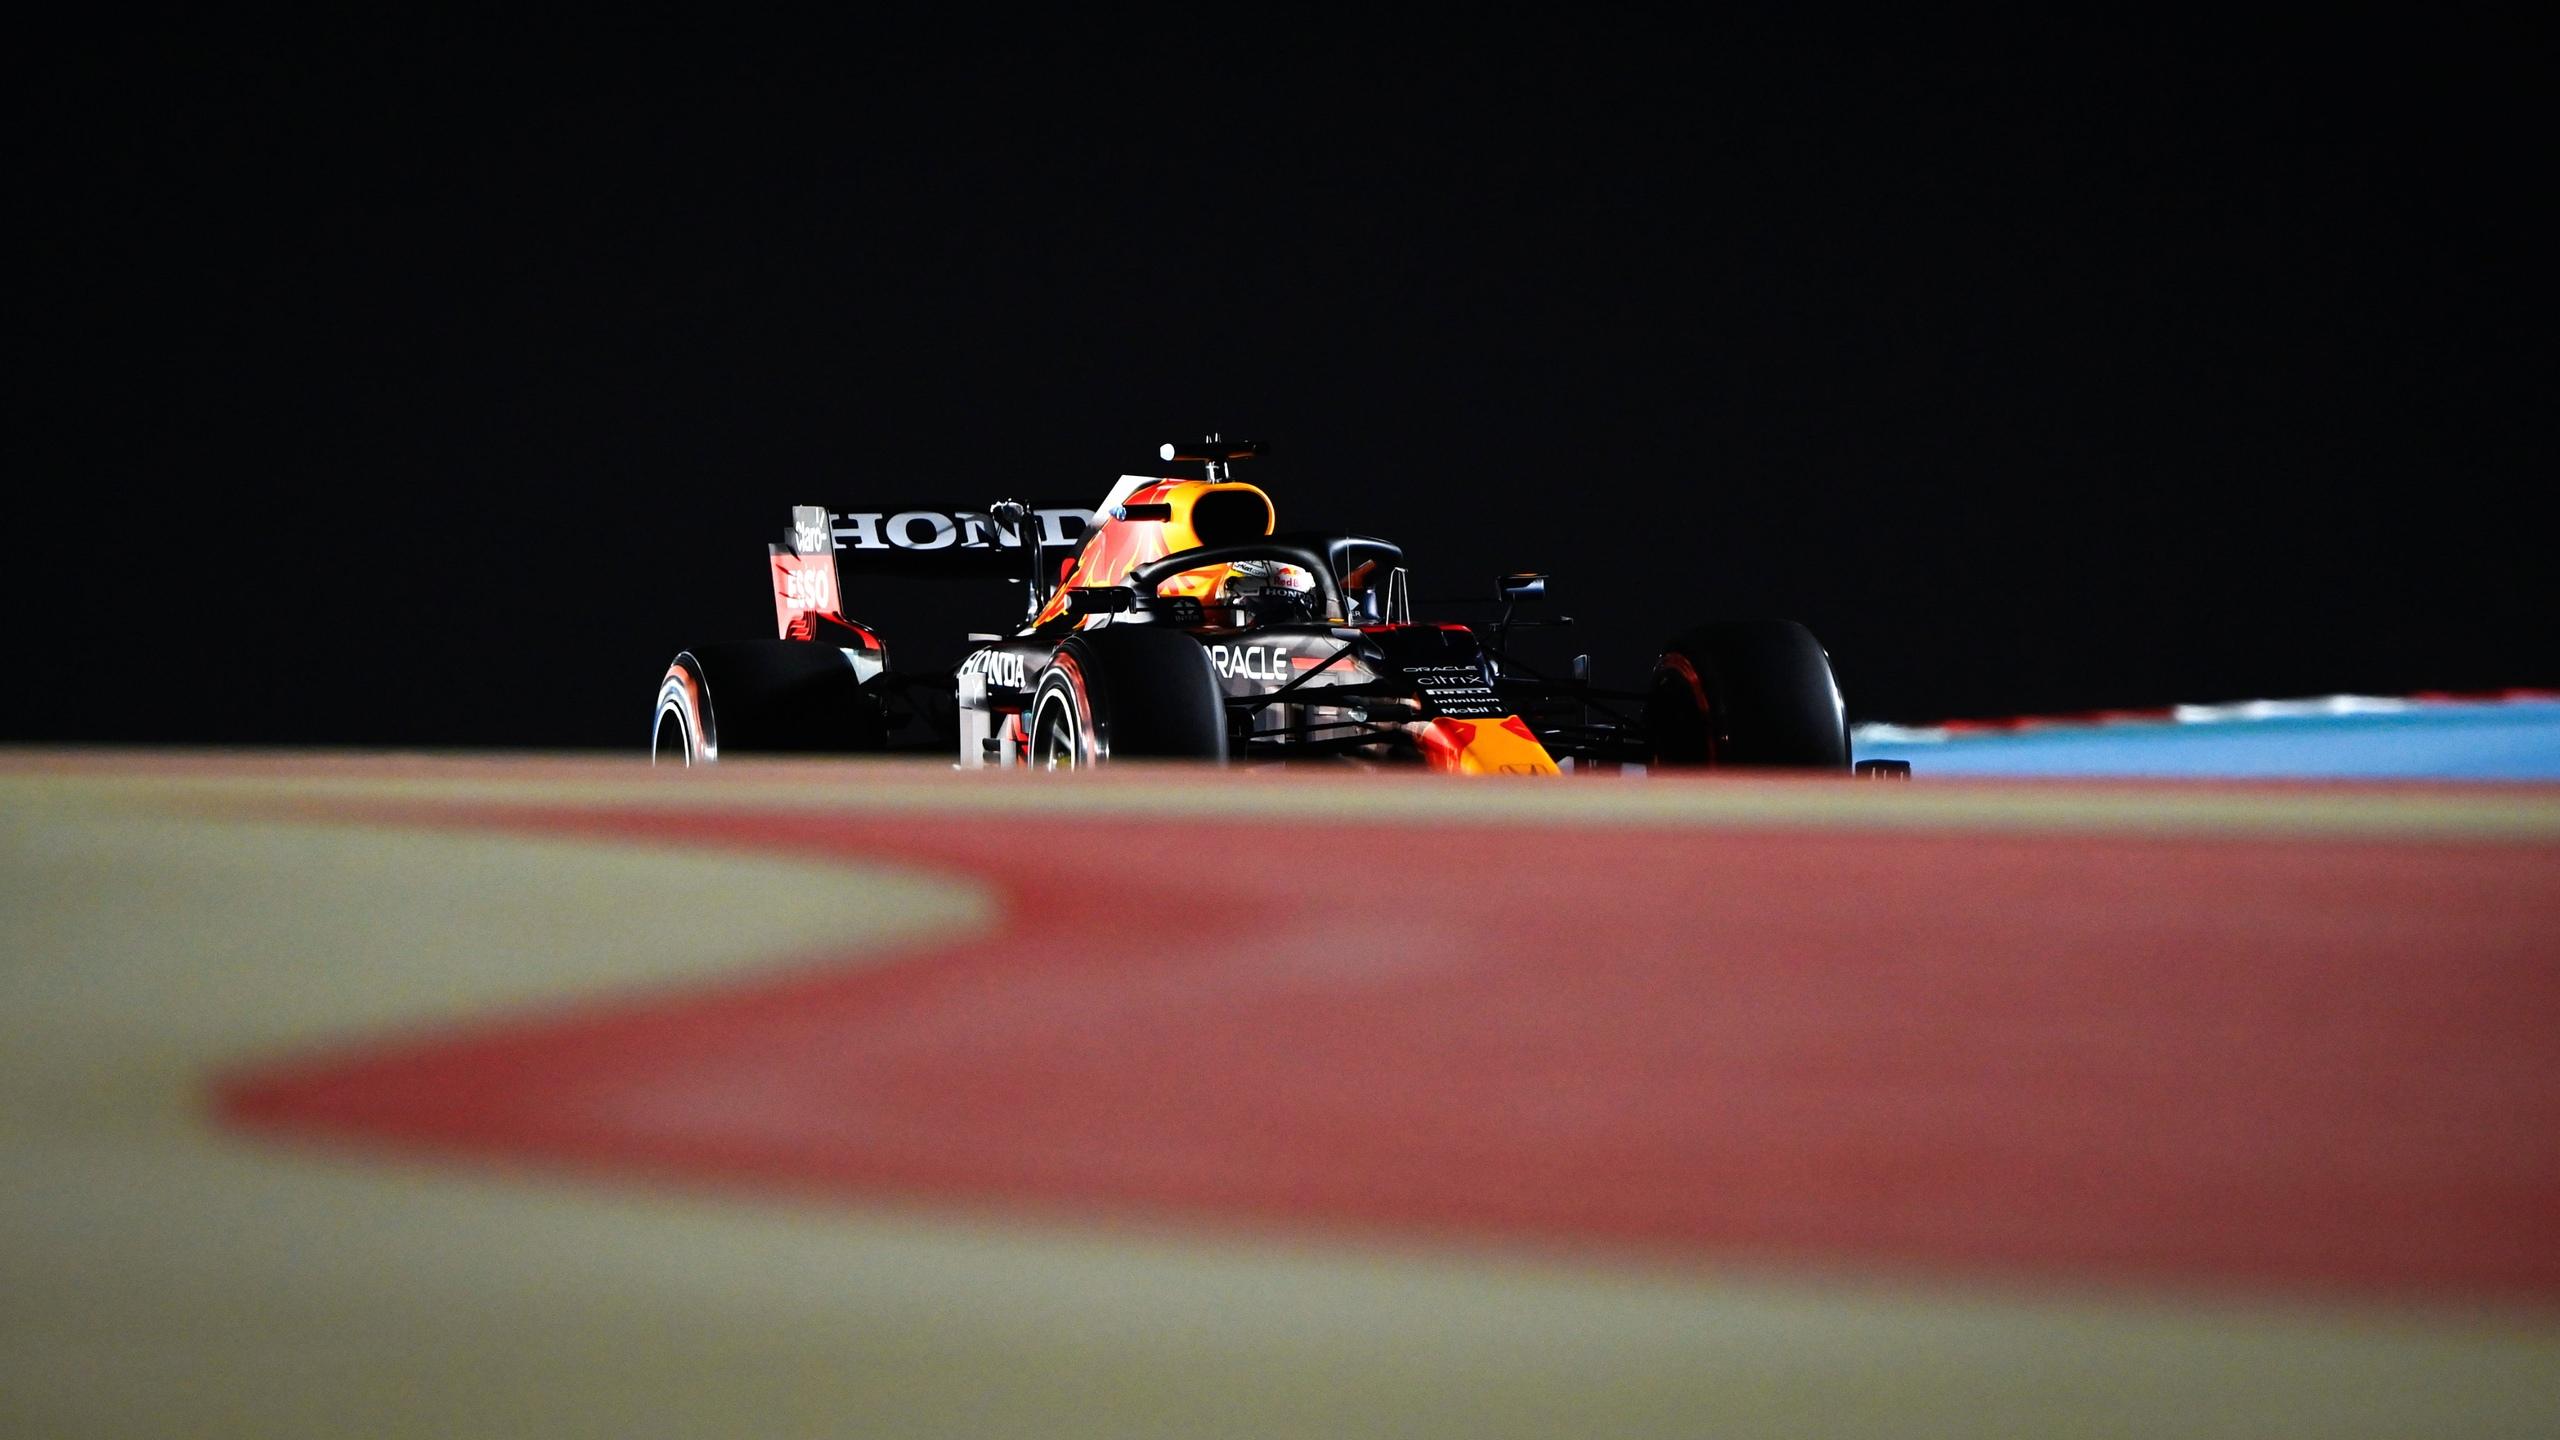 Макс Ферстаппен выигрывает квалификацию гран-при Бахрейна 2021 года